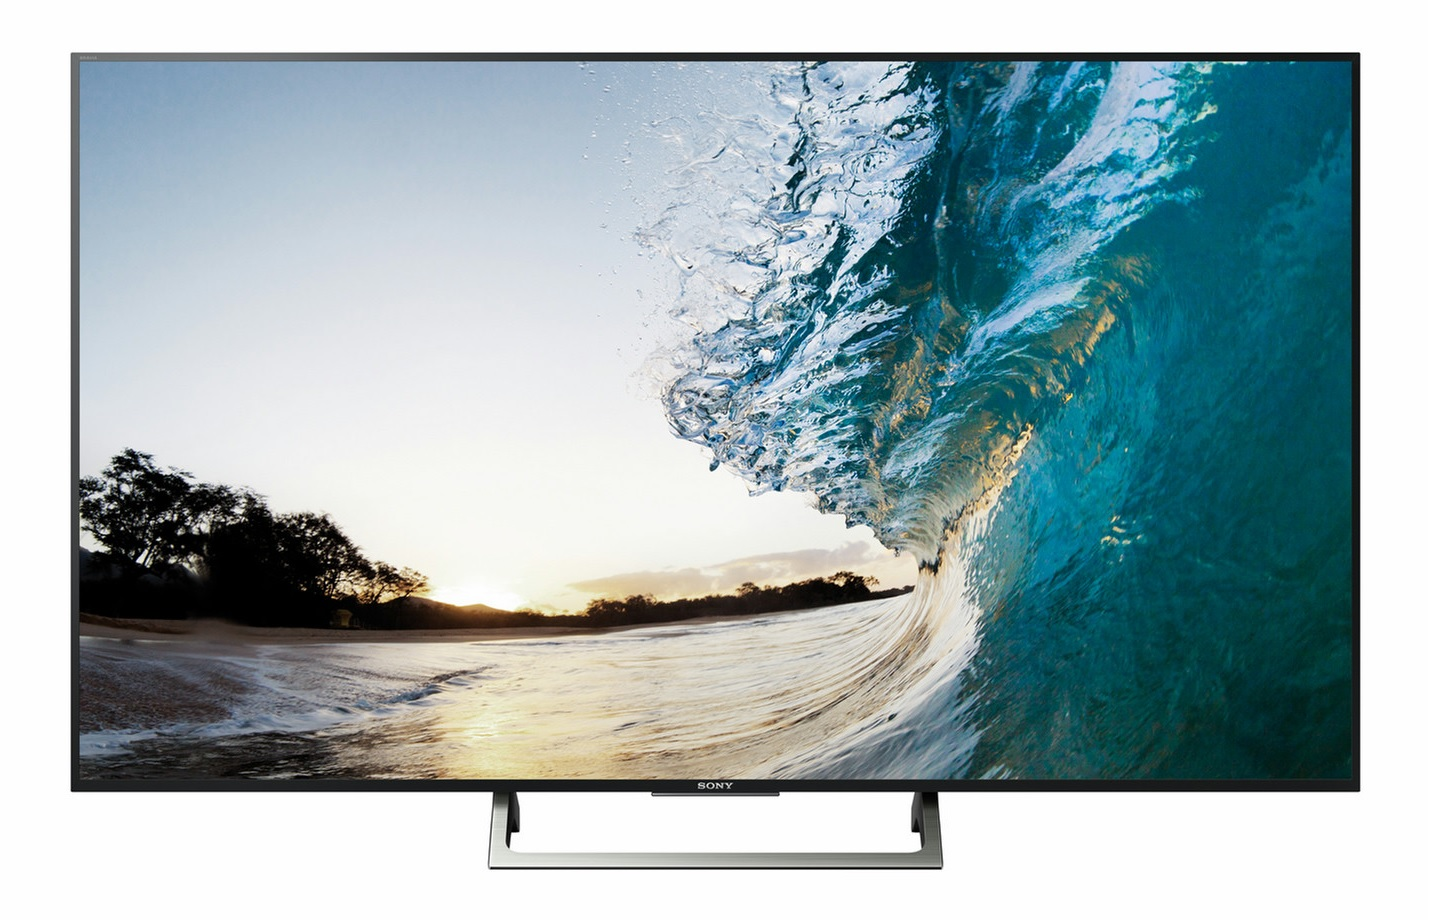 Sony KD65XE8596 65inch UHD LED LCD TV